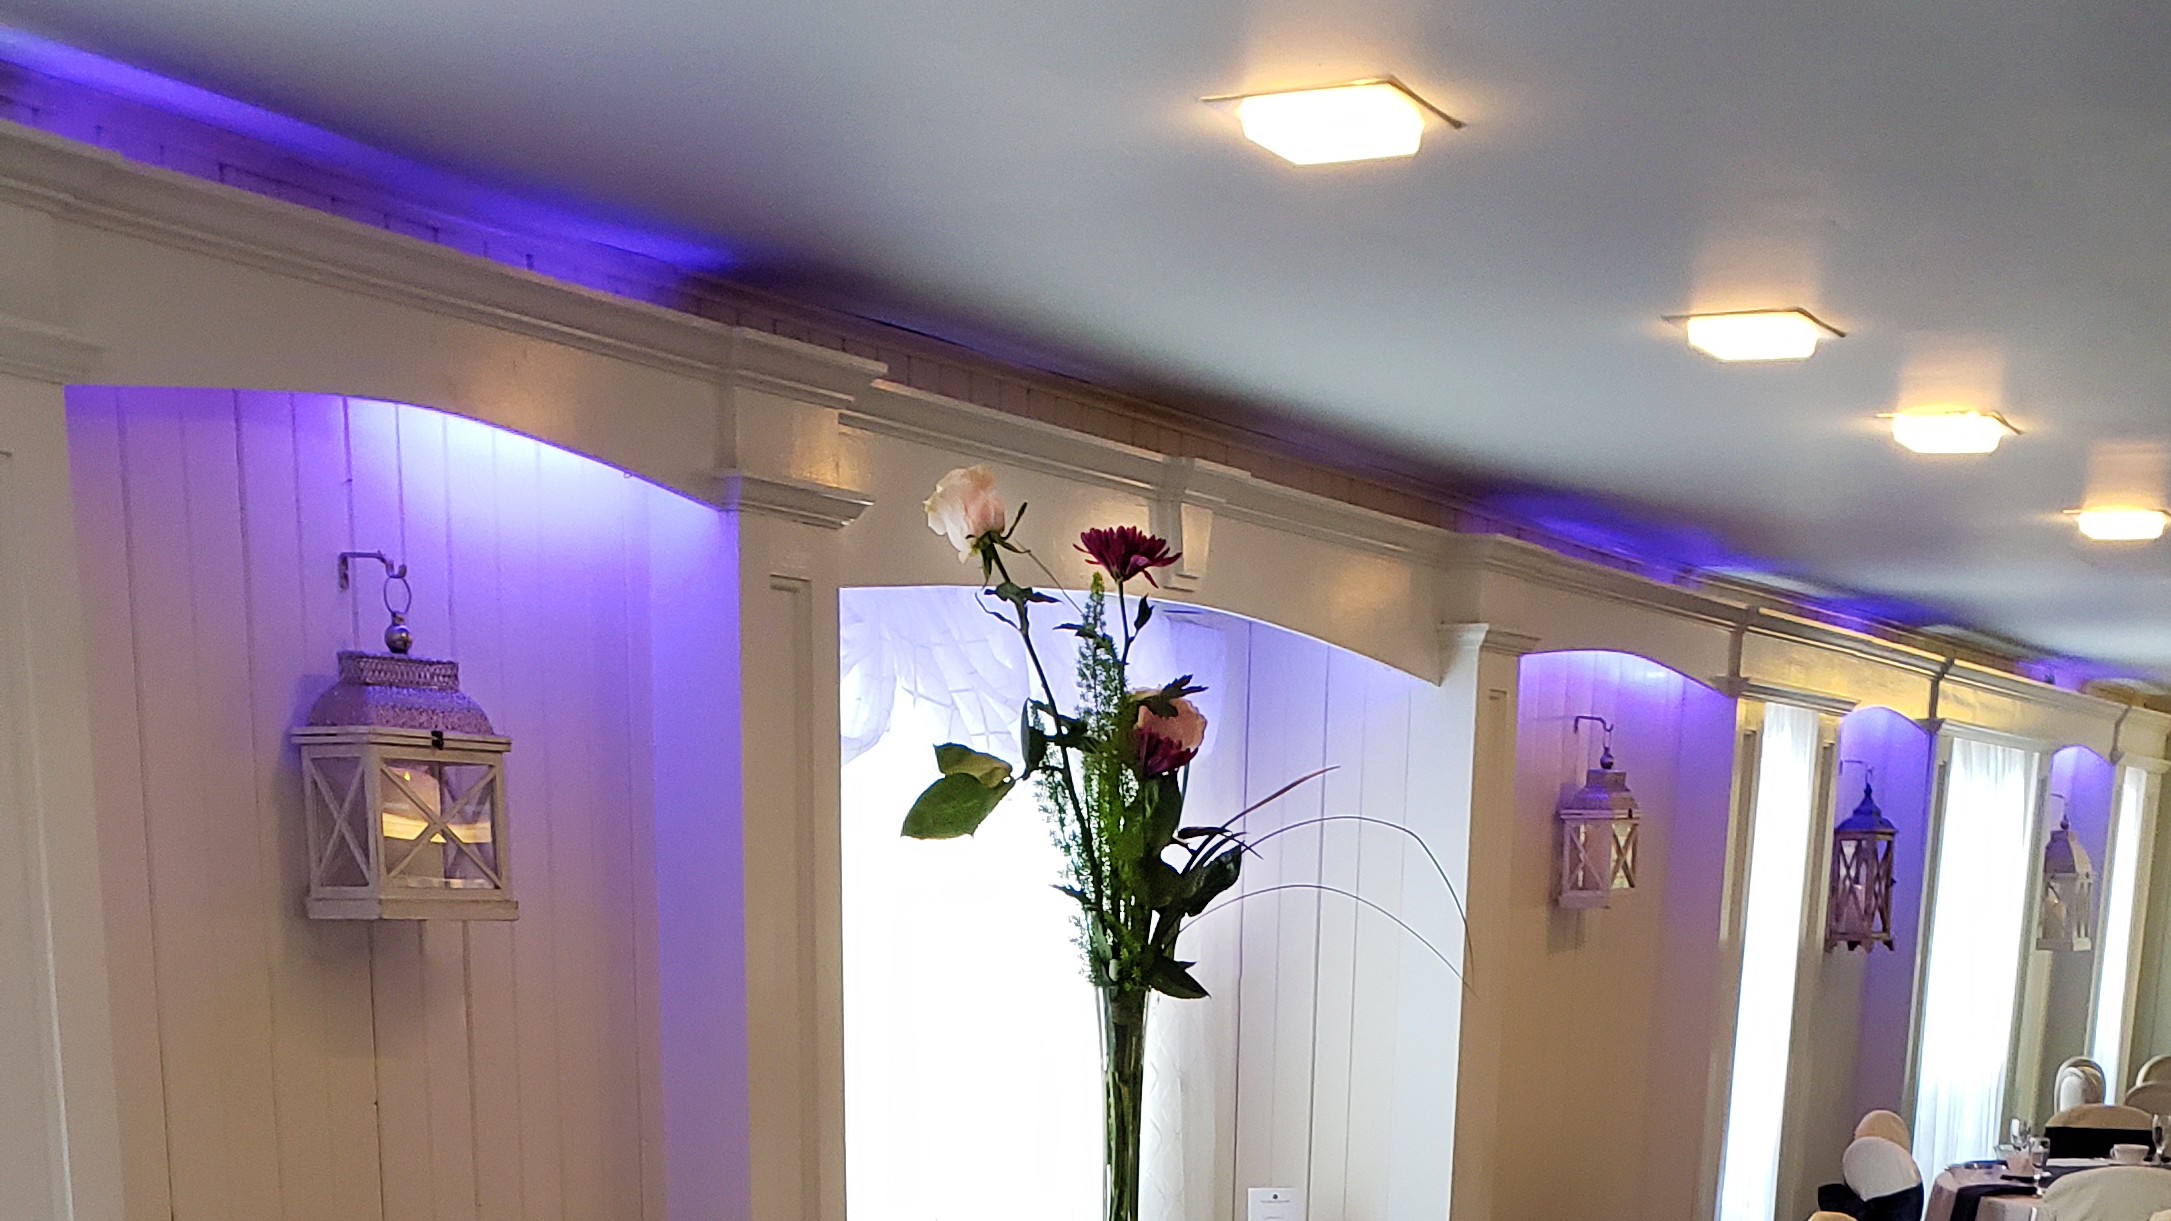 Dining Room Wall Lighting (Color Customization)